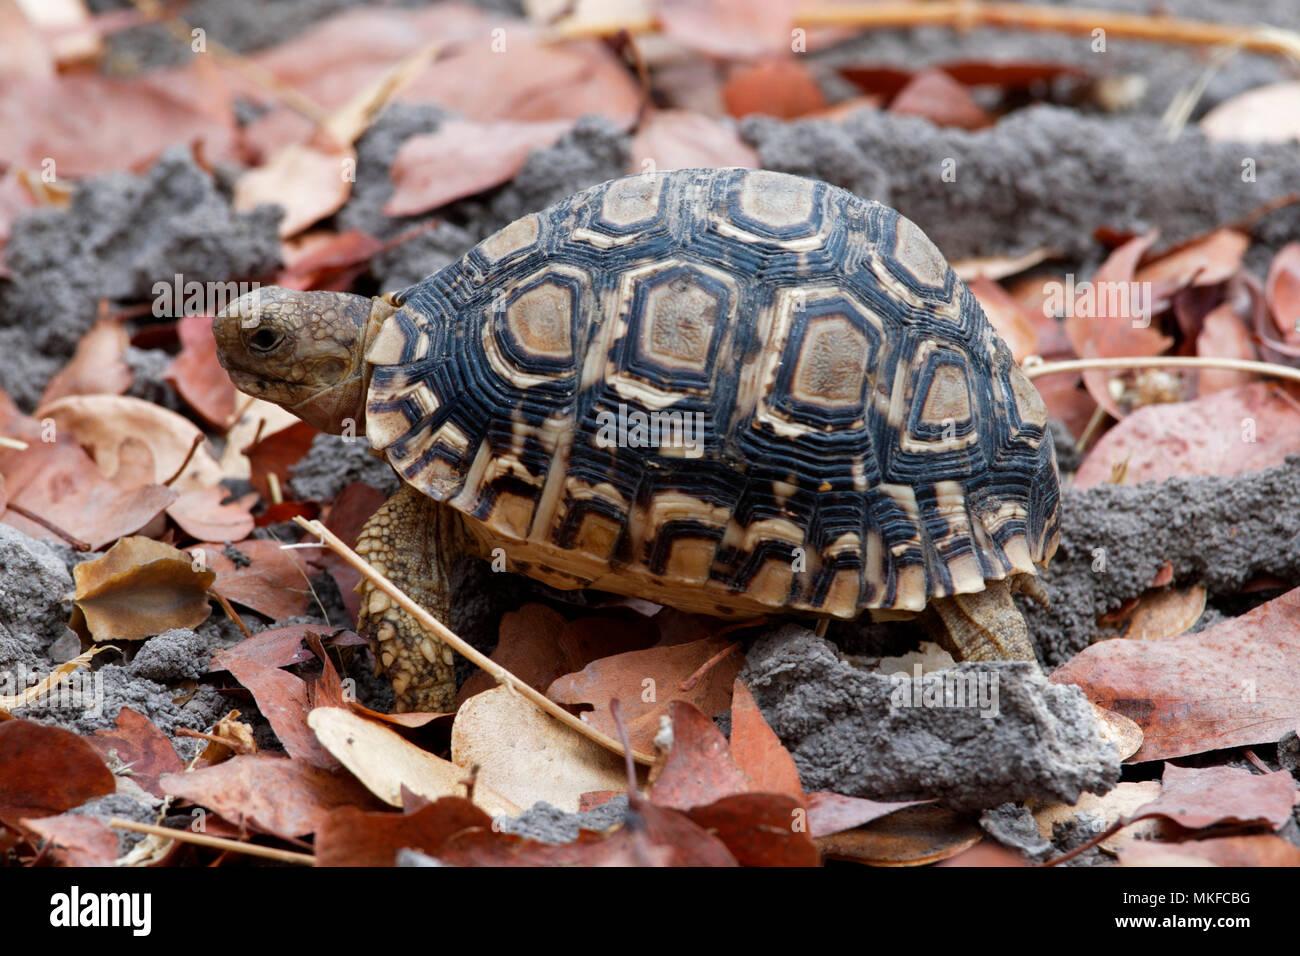 Leopard tortoise (Stigmochelys pardalis), Botswana - Stock Image